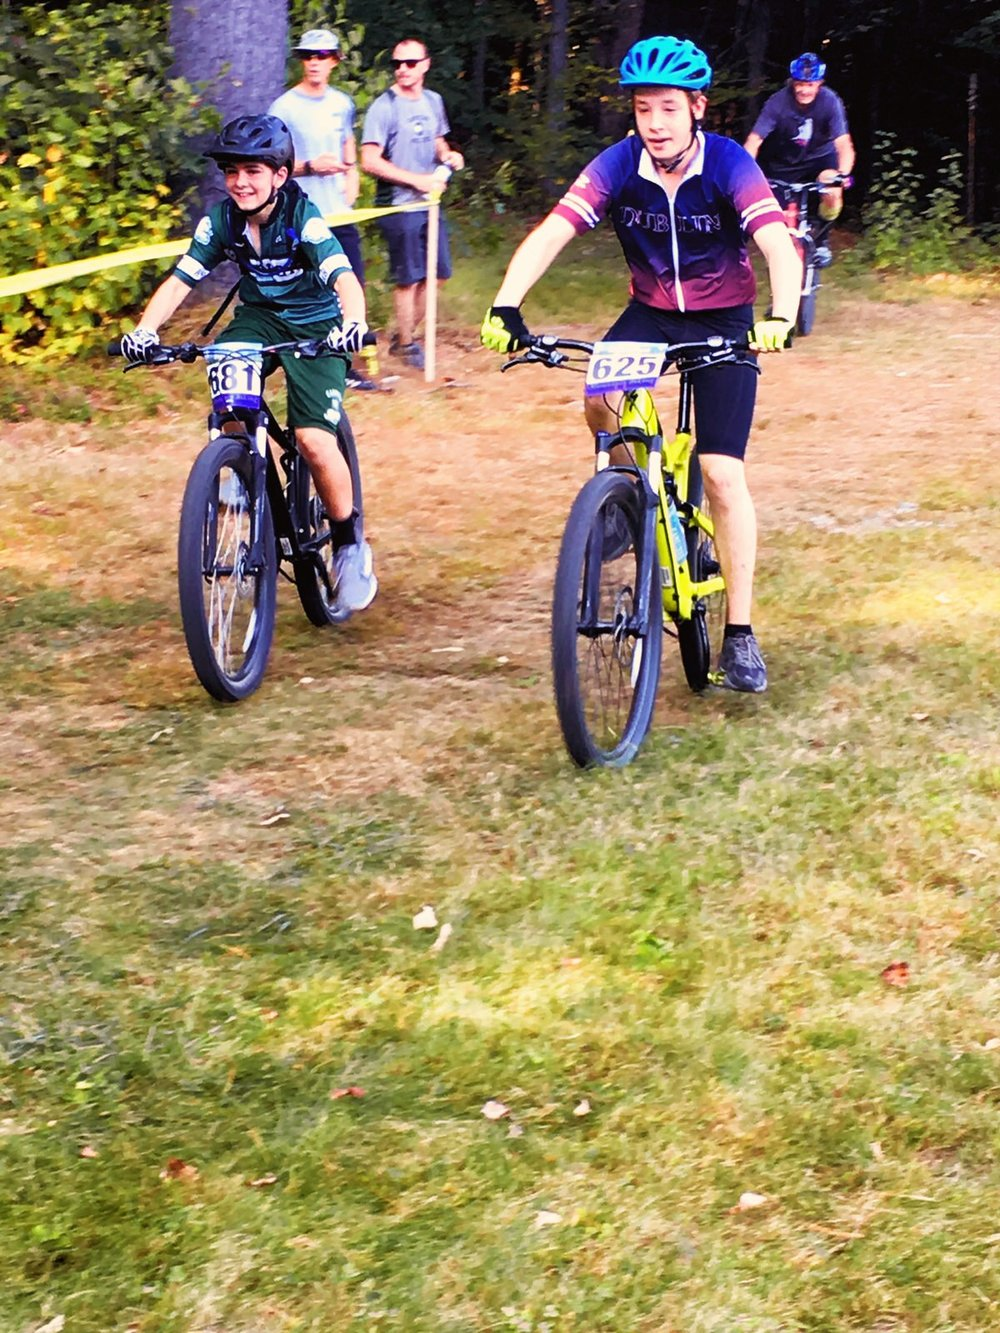 Mountain Biking at Vermont Academy - September 27, 2017  - 7955.JPG